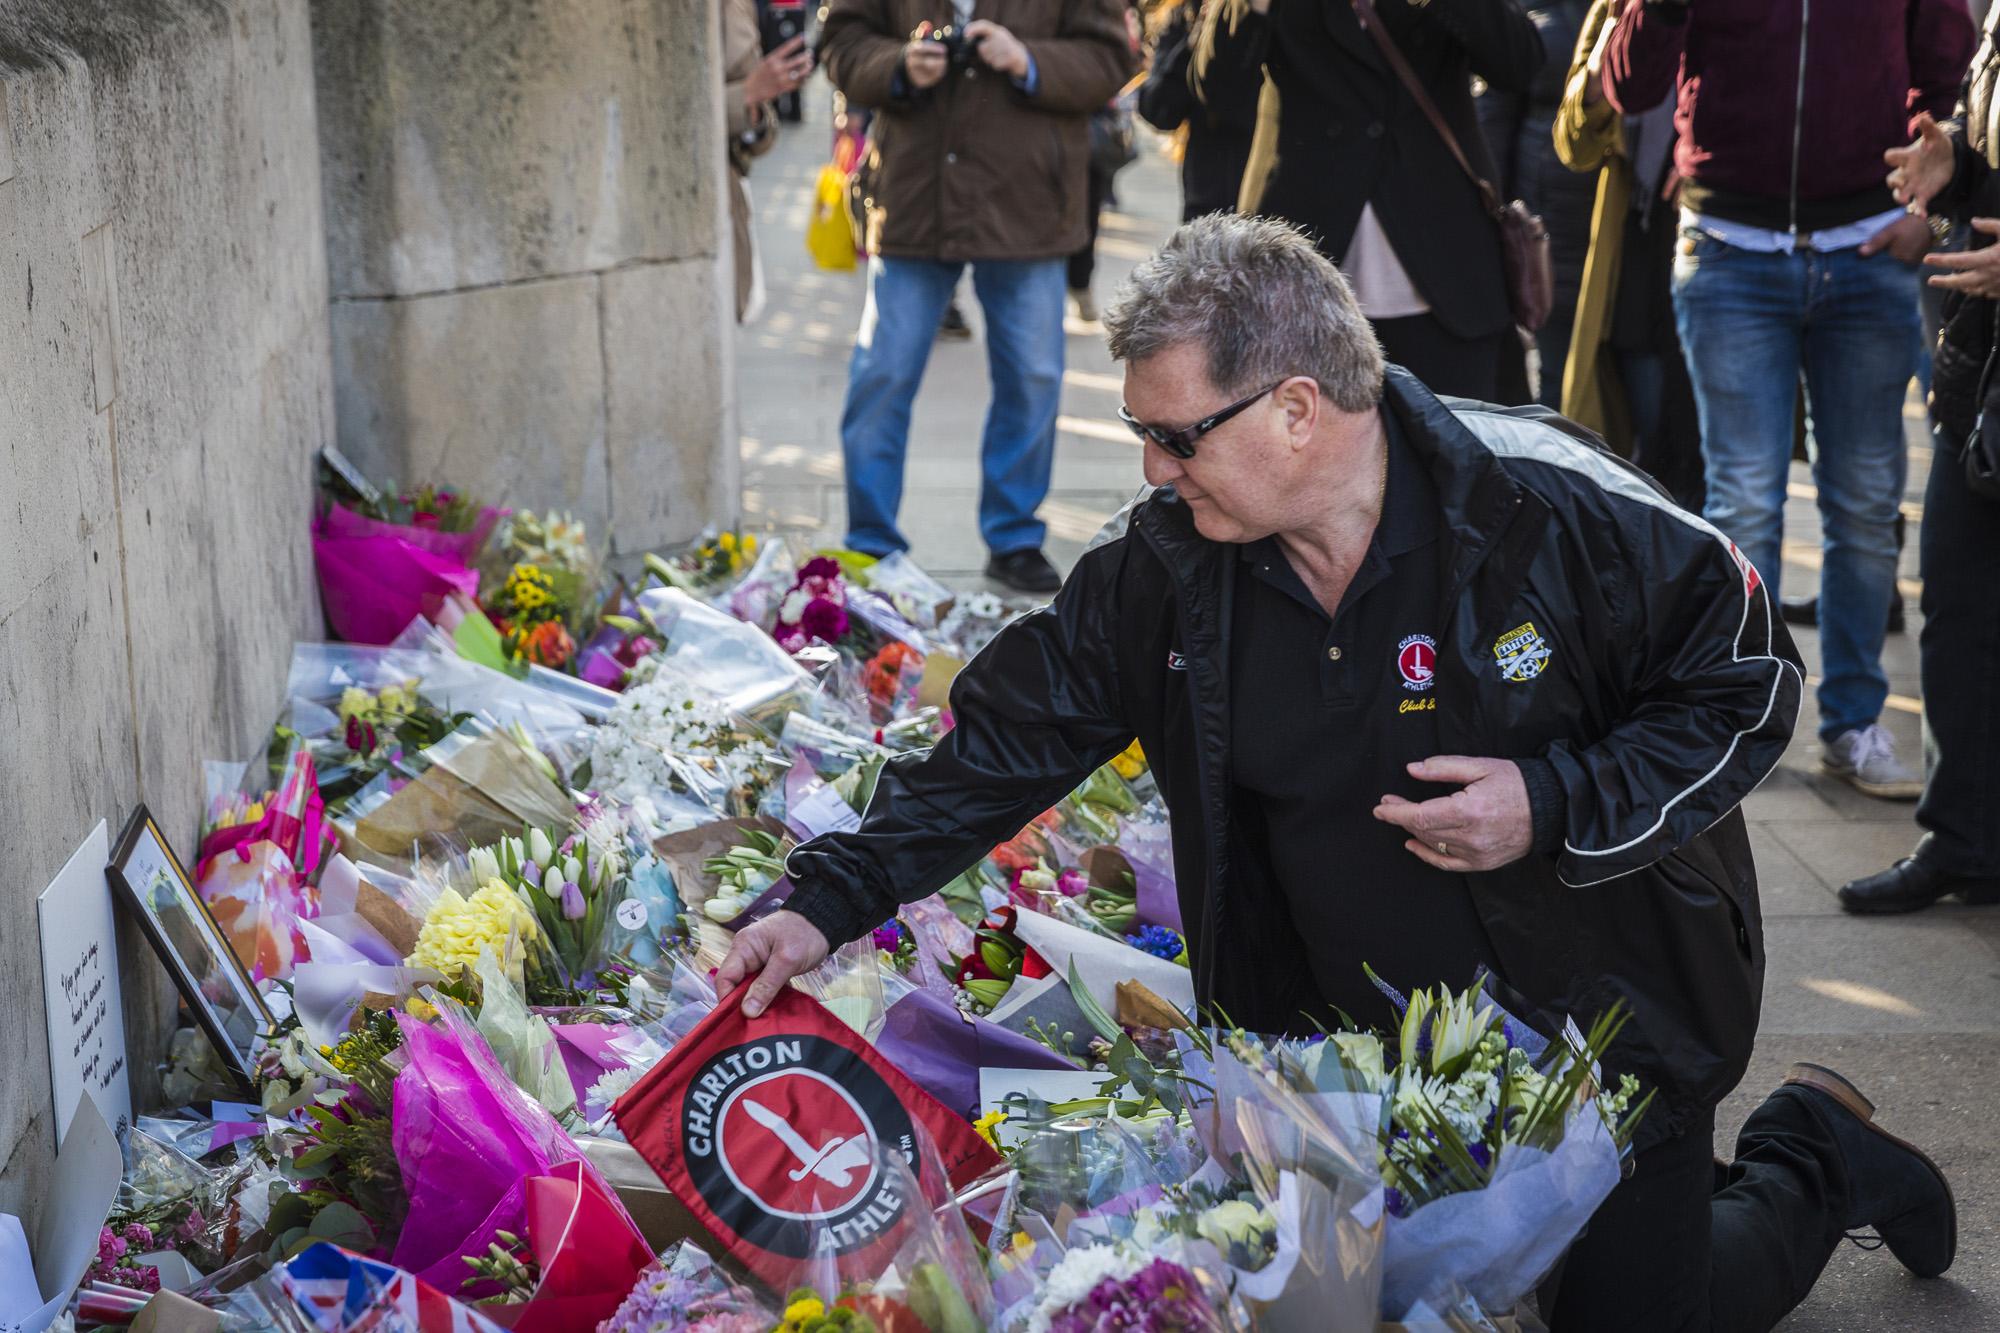 London_Attack_Hope_Not_Hate-15.jpg